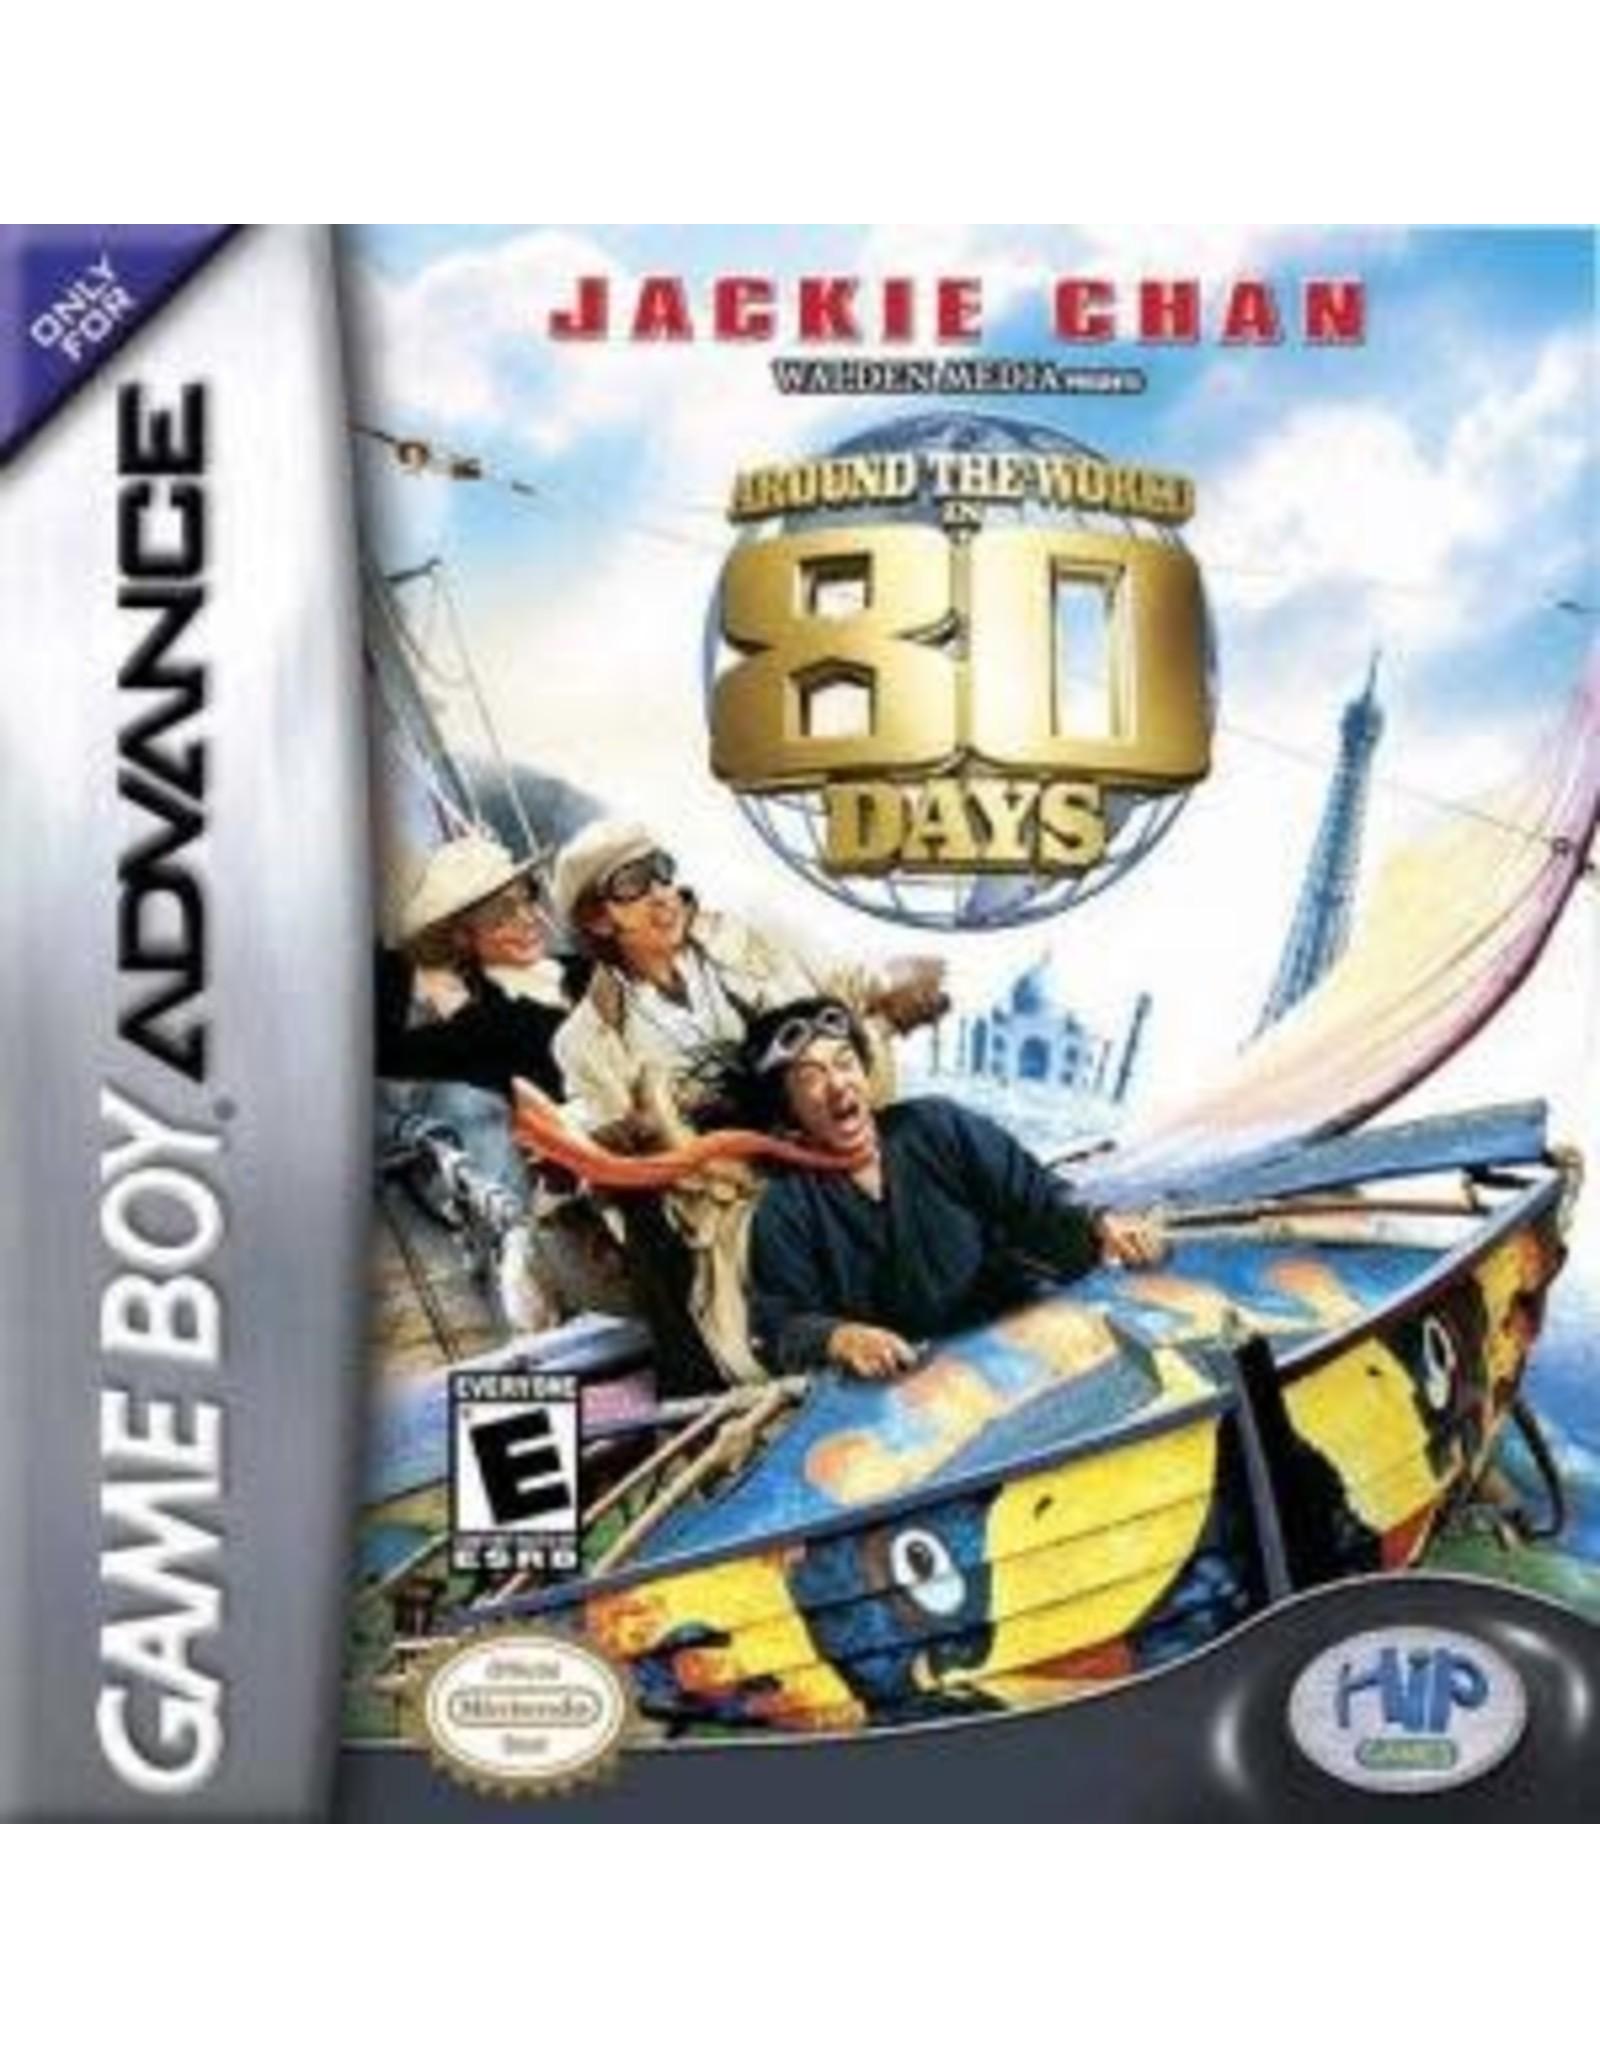 GameBoy Advance Around the World in 80 Days (Cart Only)